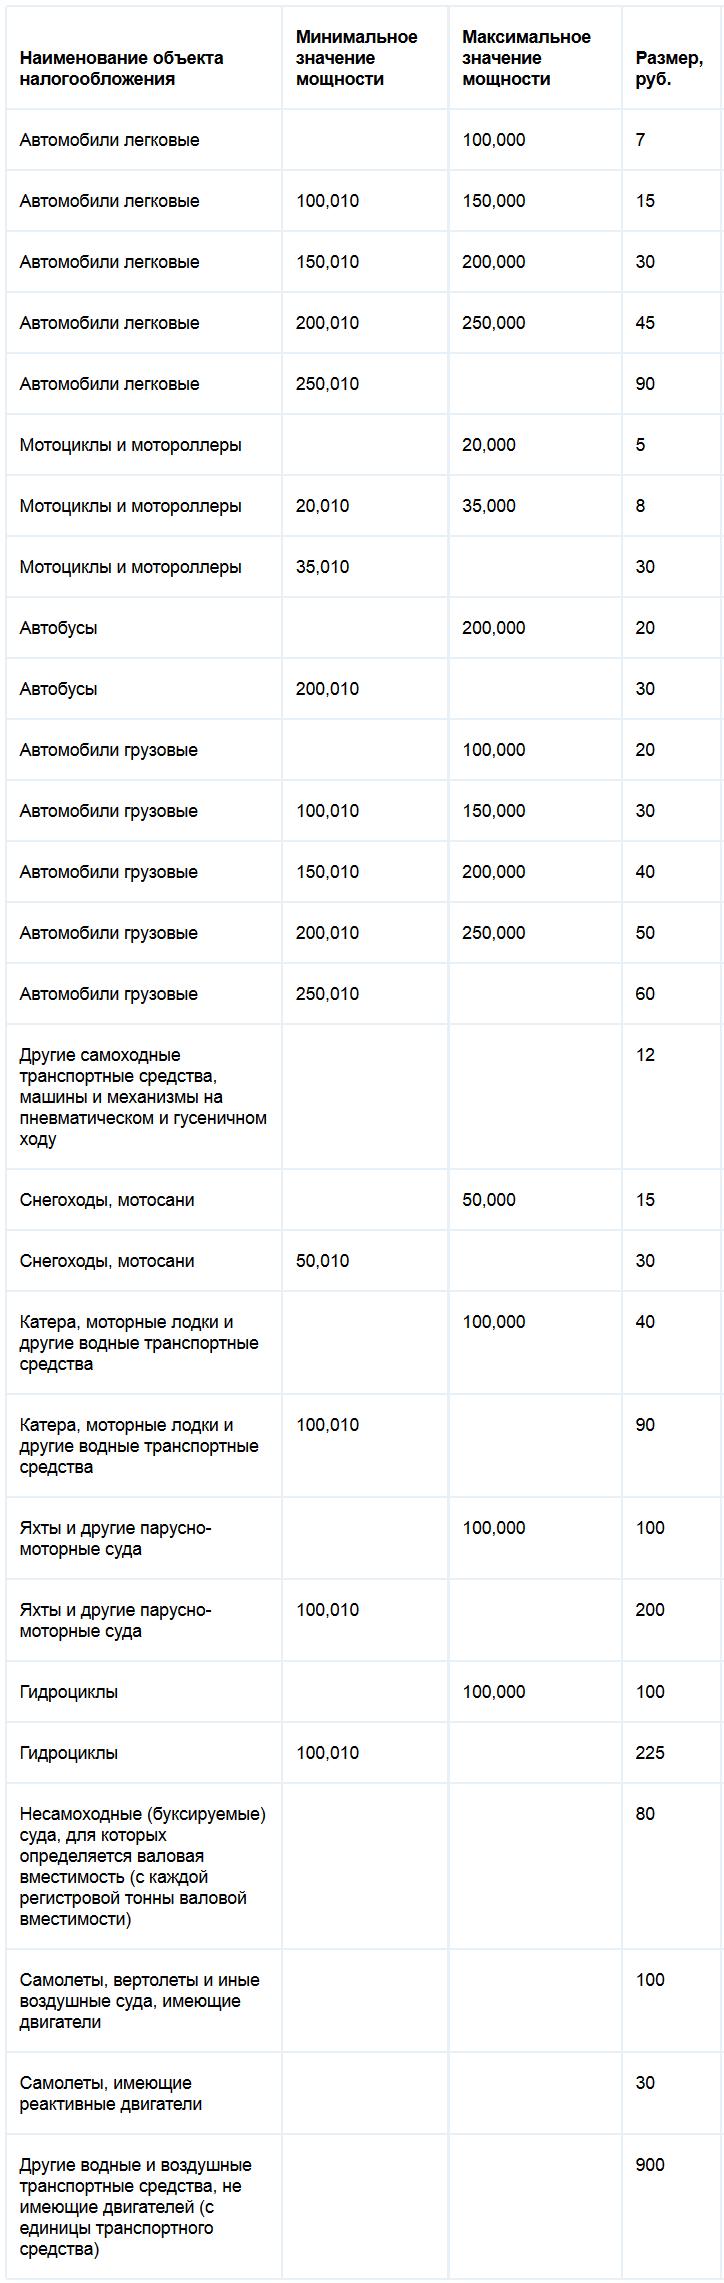 Ставки транспортного налога Омской области